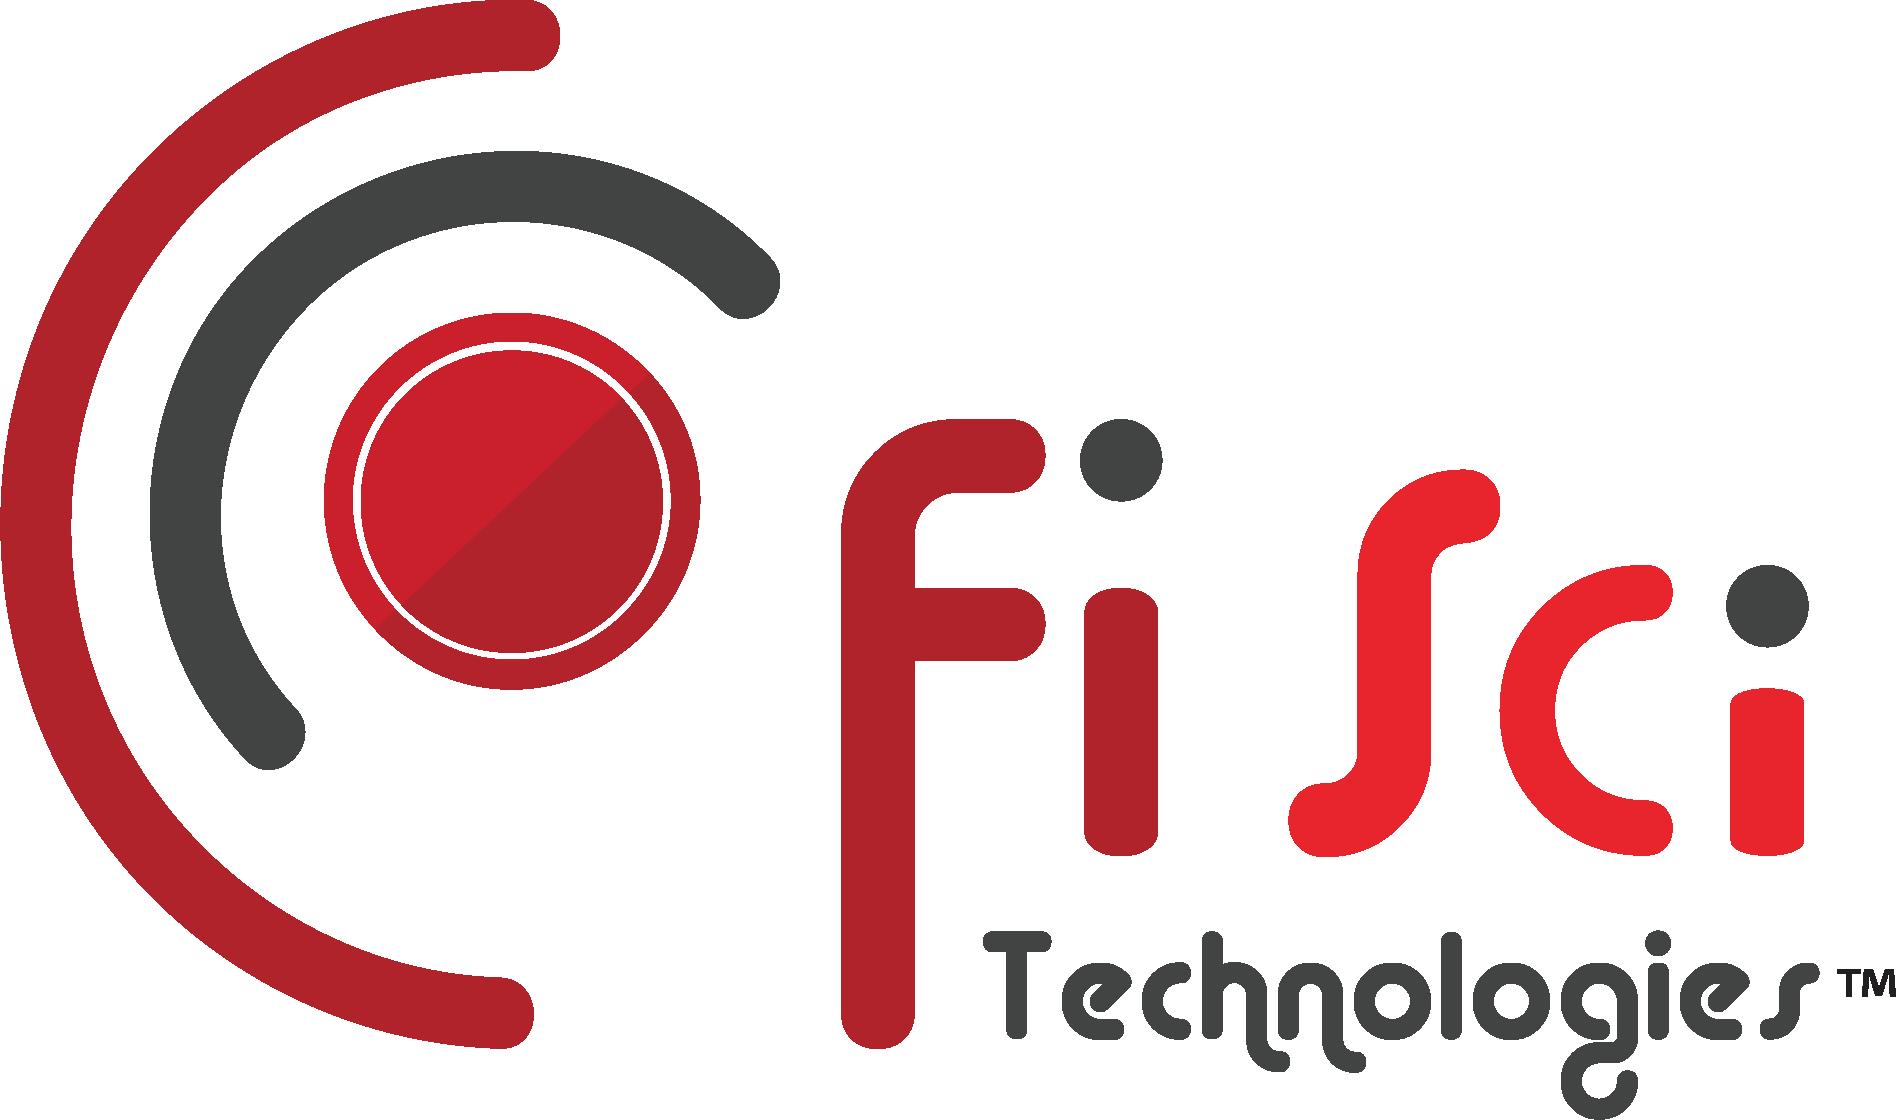 FiSci Technologies